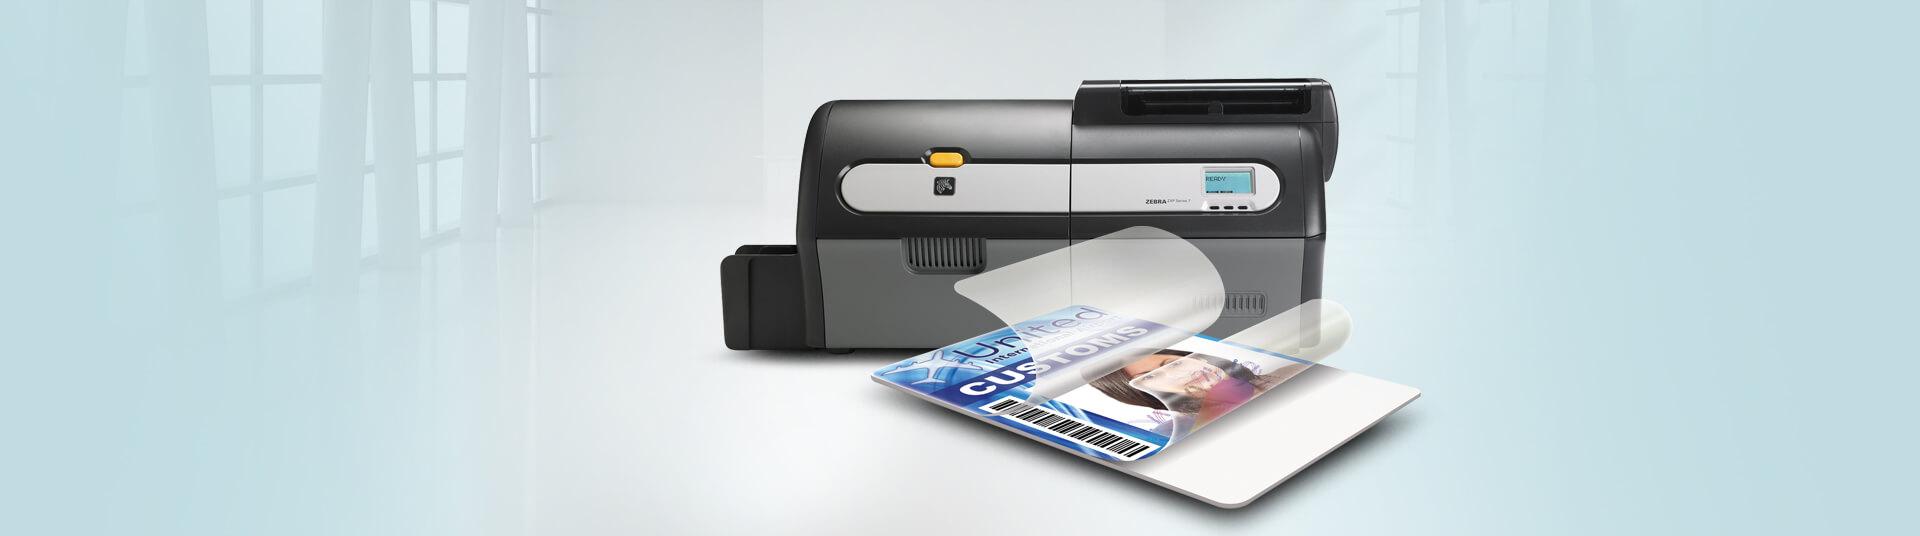 Laminating Photo ID Printers